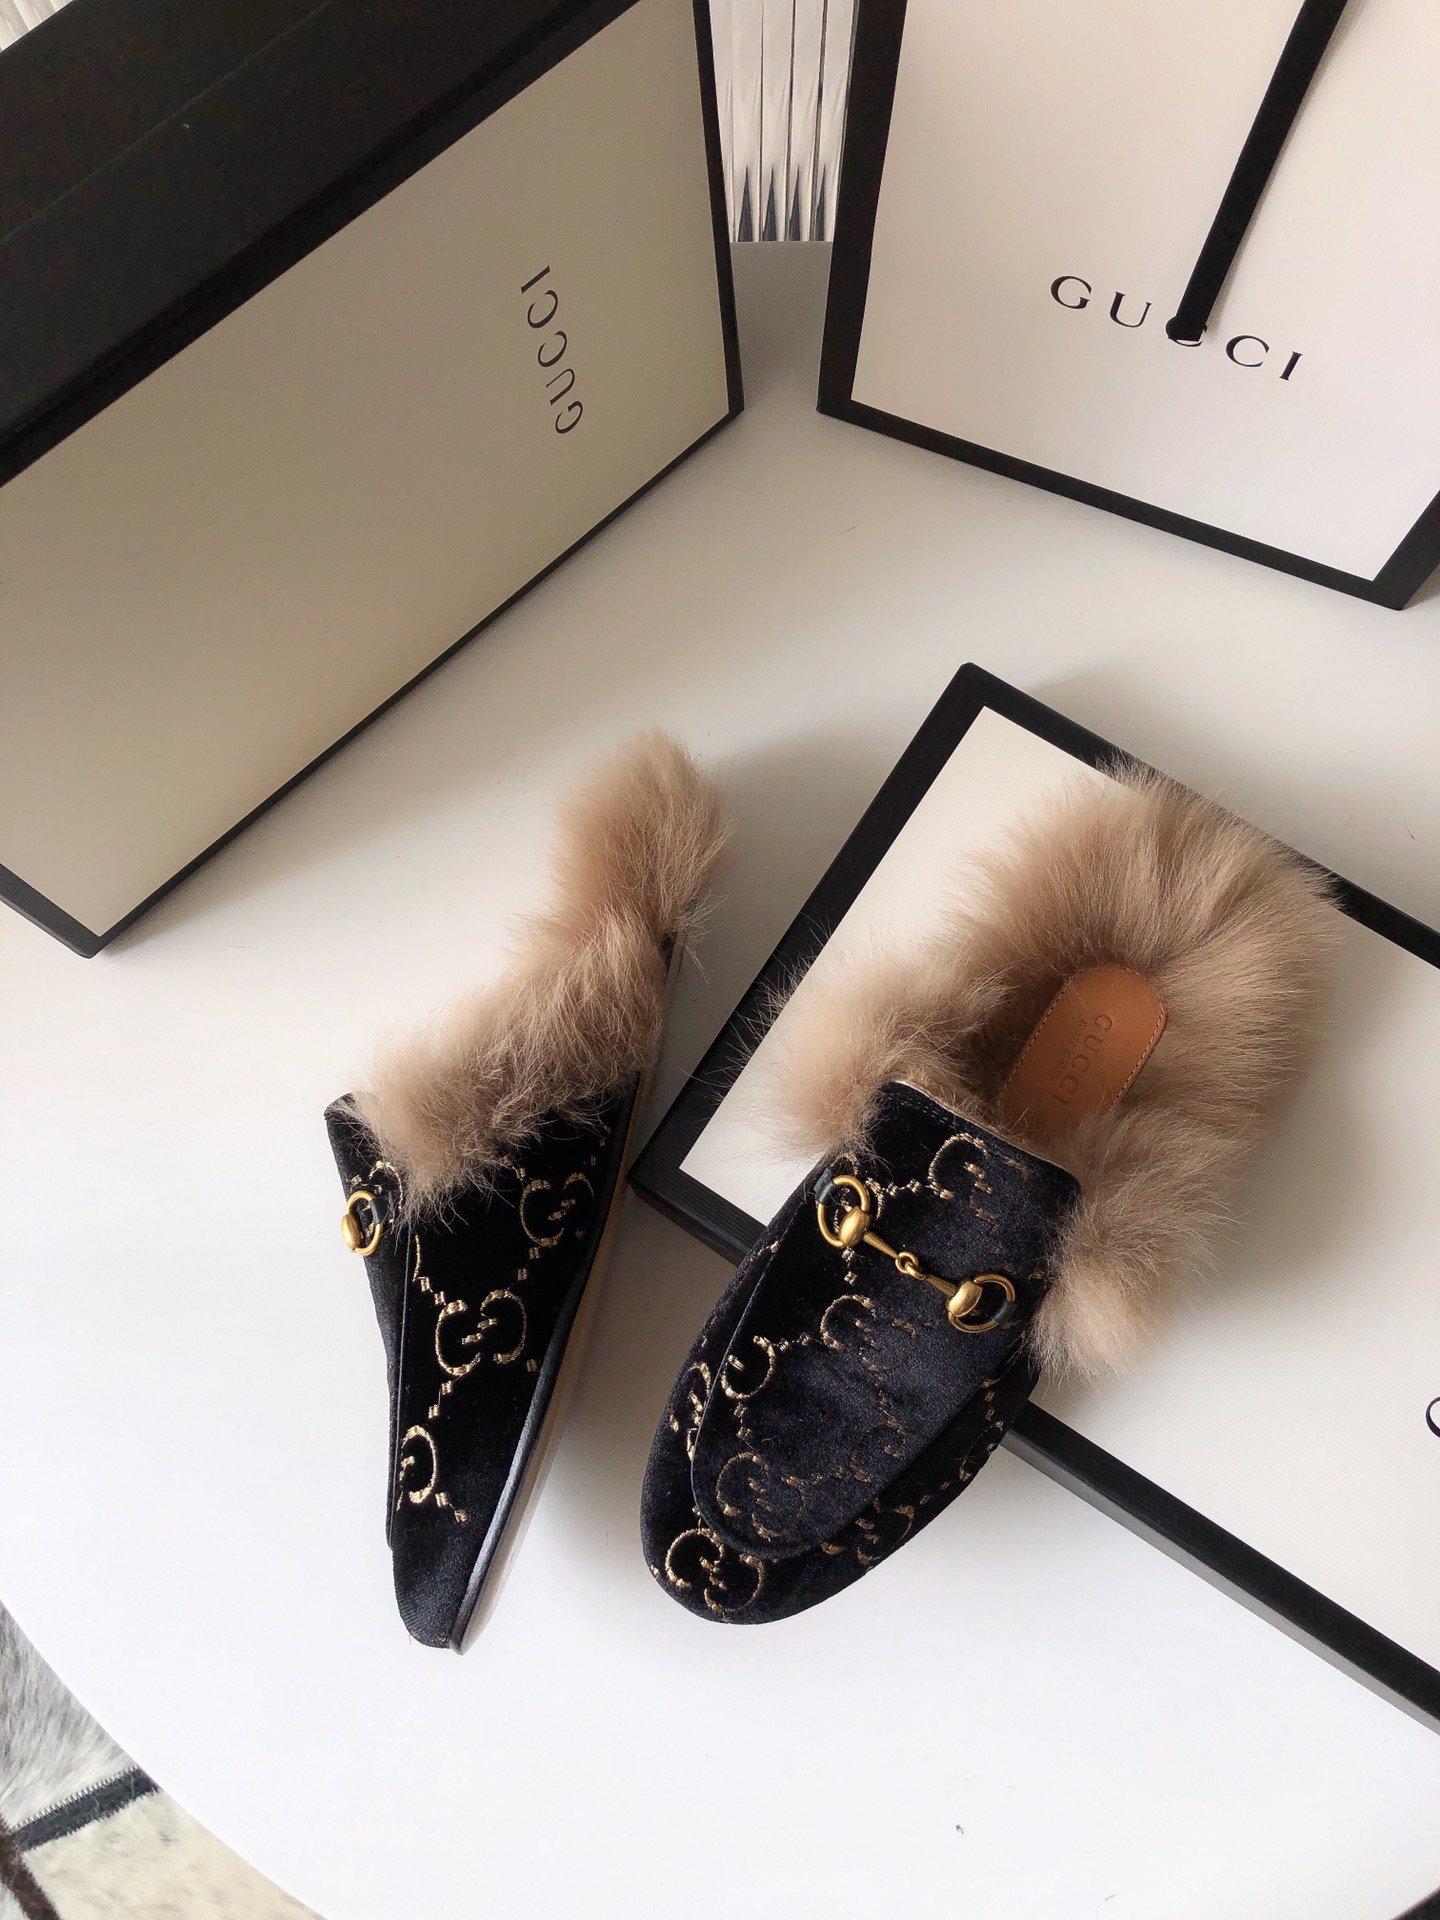 Gucci古奇 羔羊毛穆勒鞋双GG绣明星同款(图7)